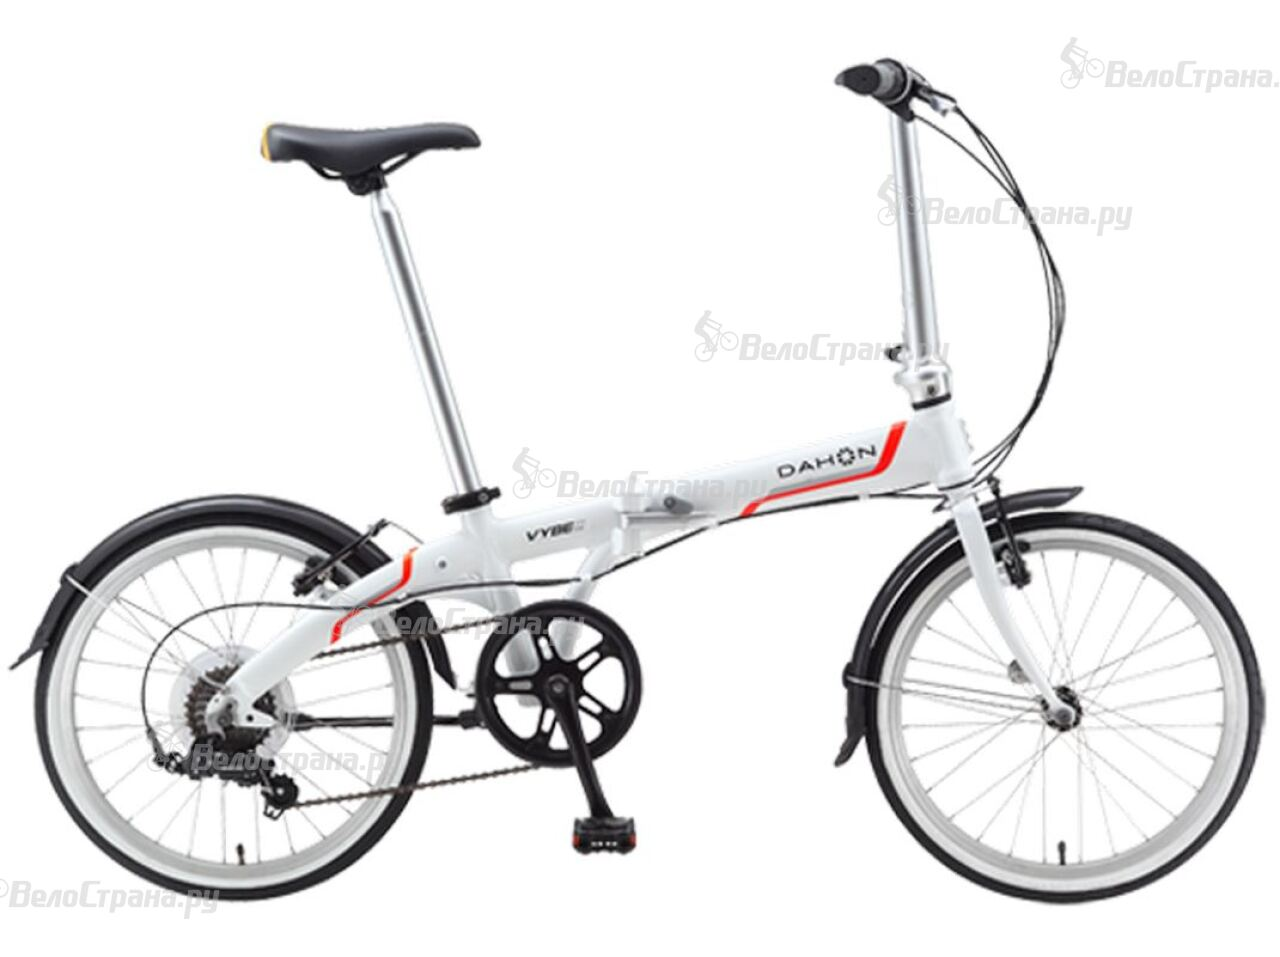 Велосипед Dahon Vybe D7 (2015) велосипед dahon speed d7 2014